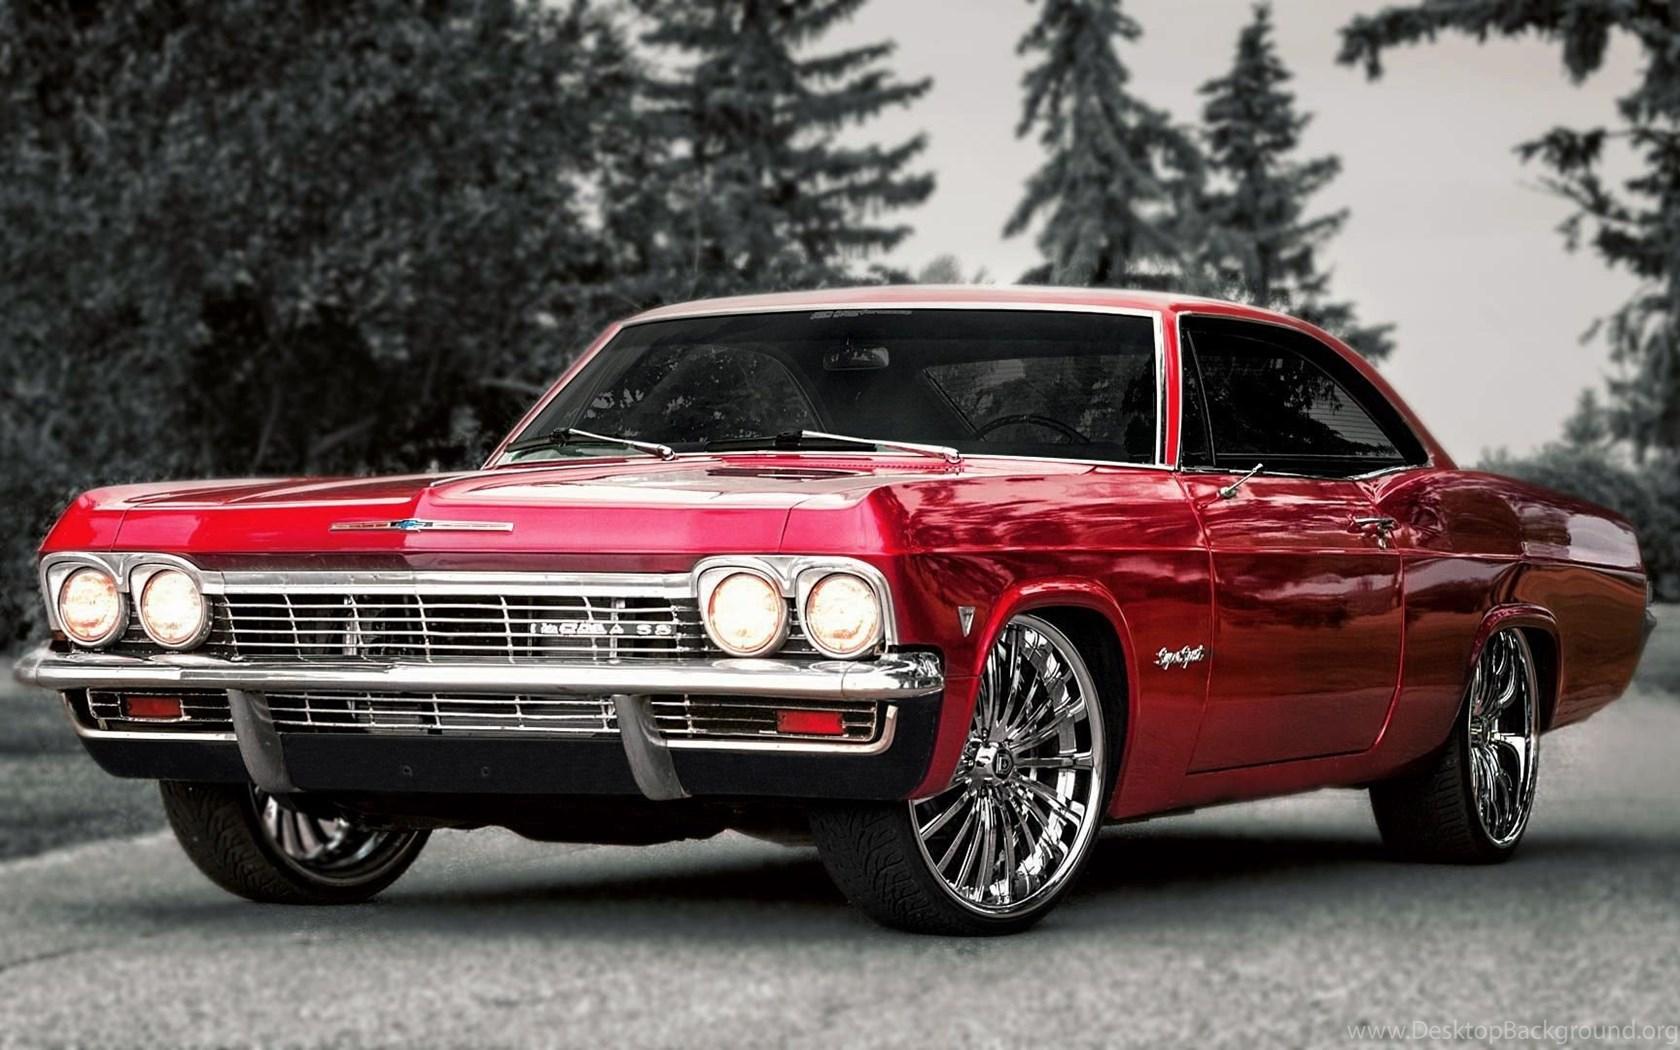 Impala 99 chevy impala : HQ Chevrolet Impala Wallpapers Desktop Background